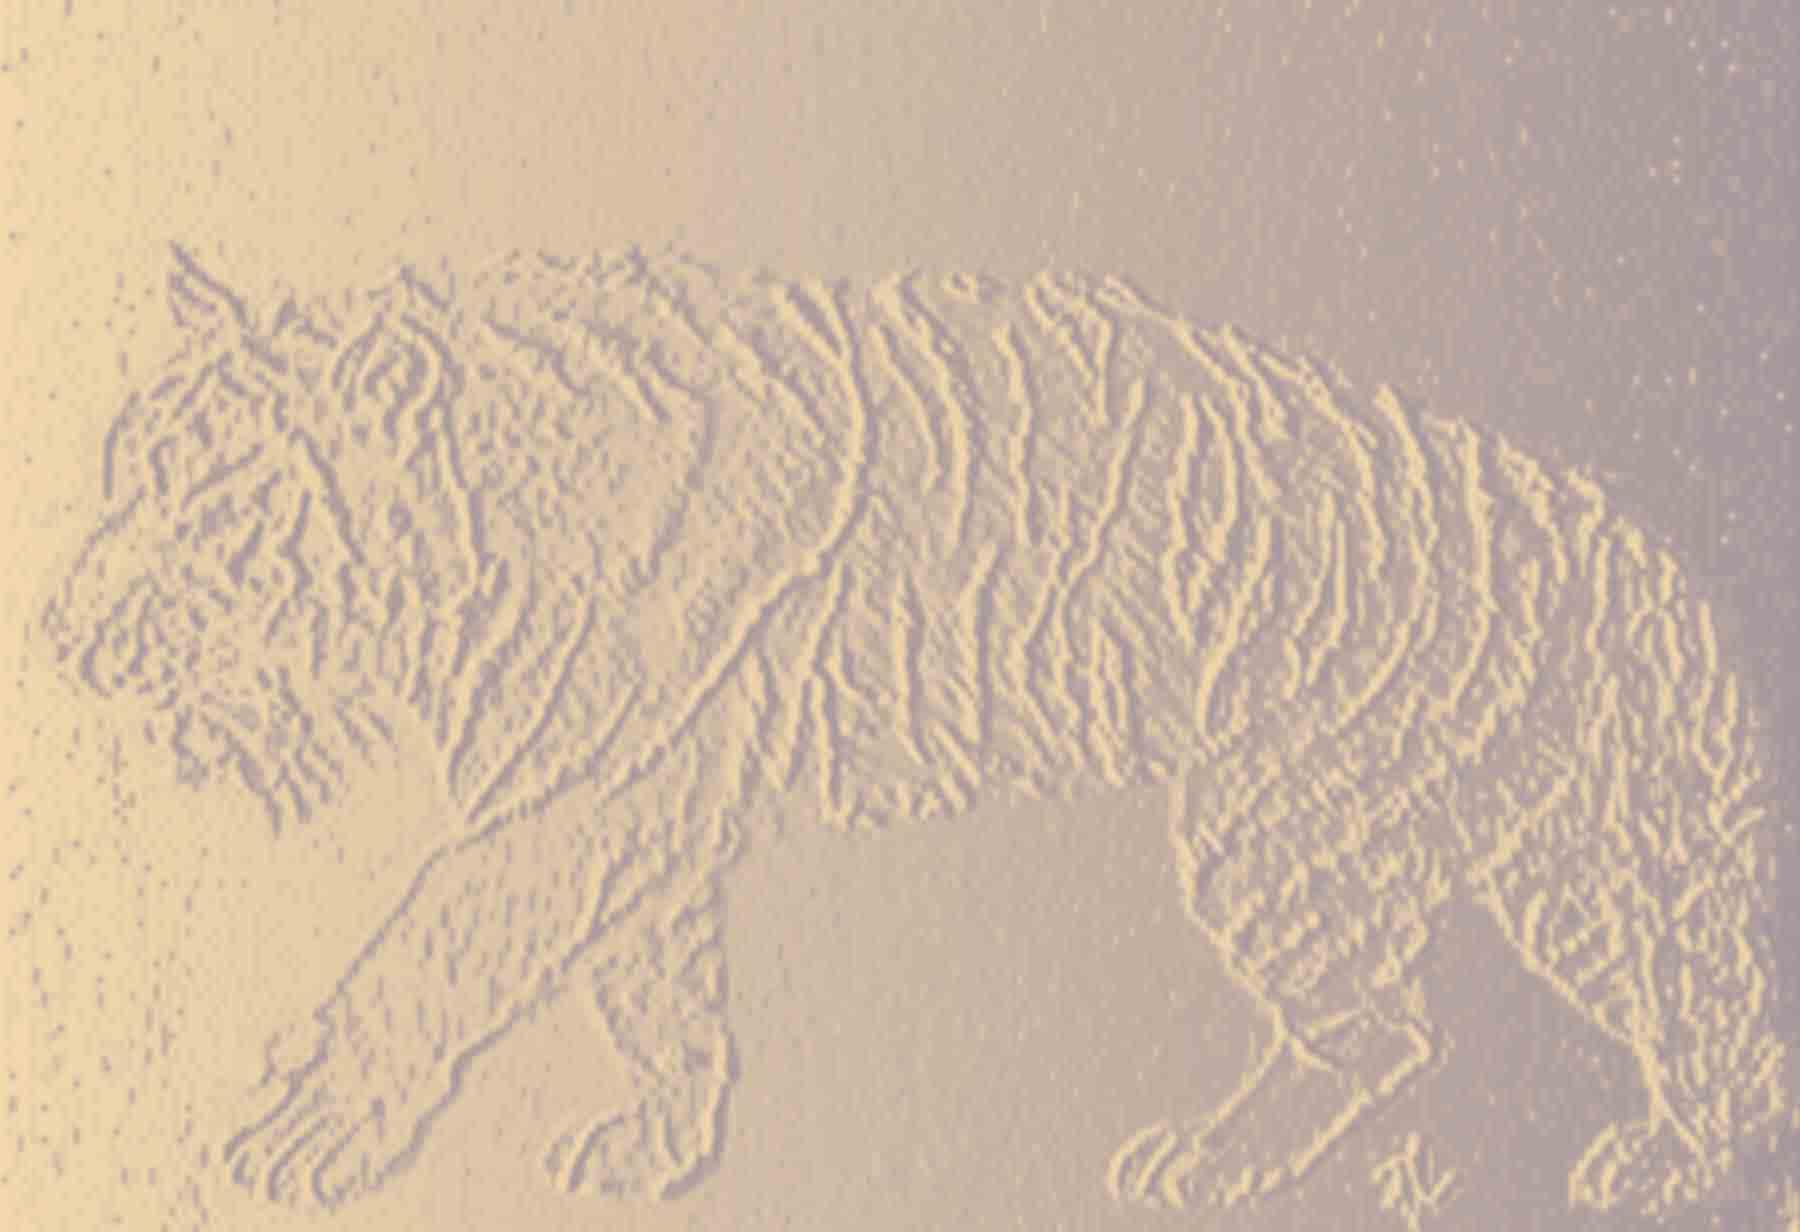 Soul Nourishment - Pencil Drawing Tiger